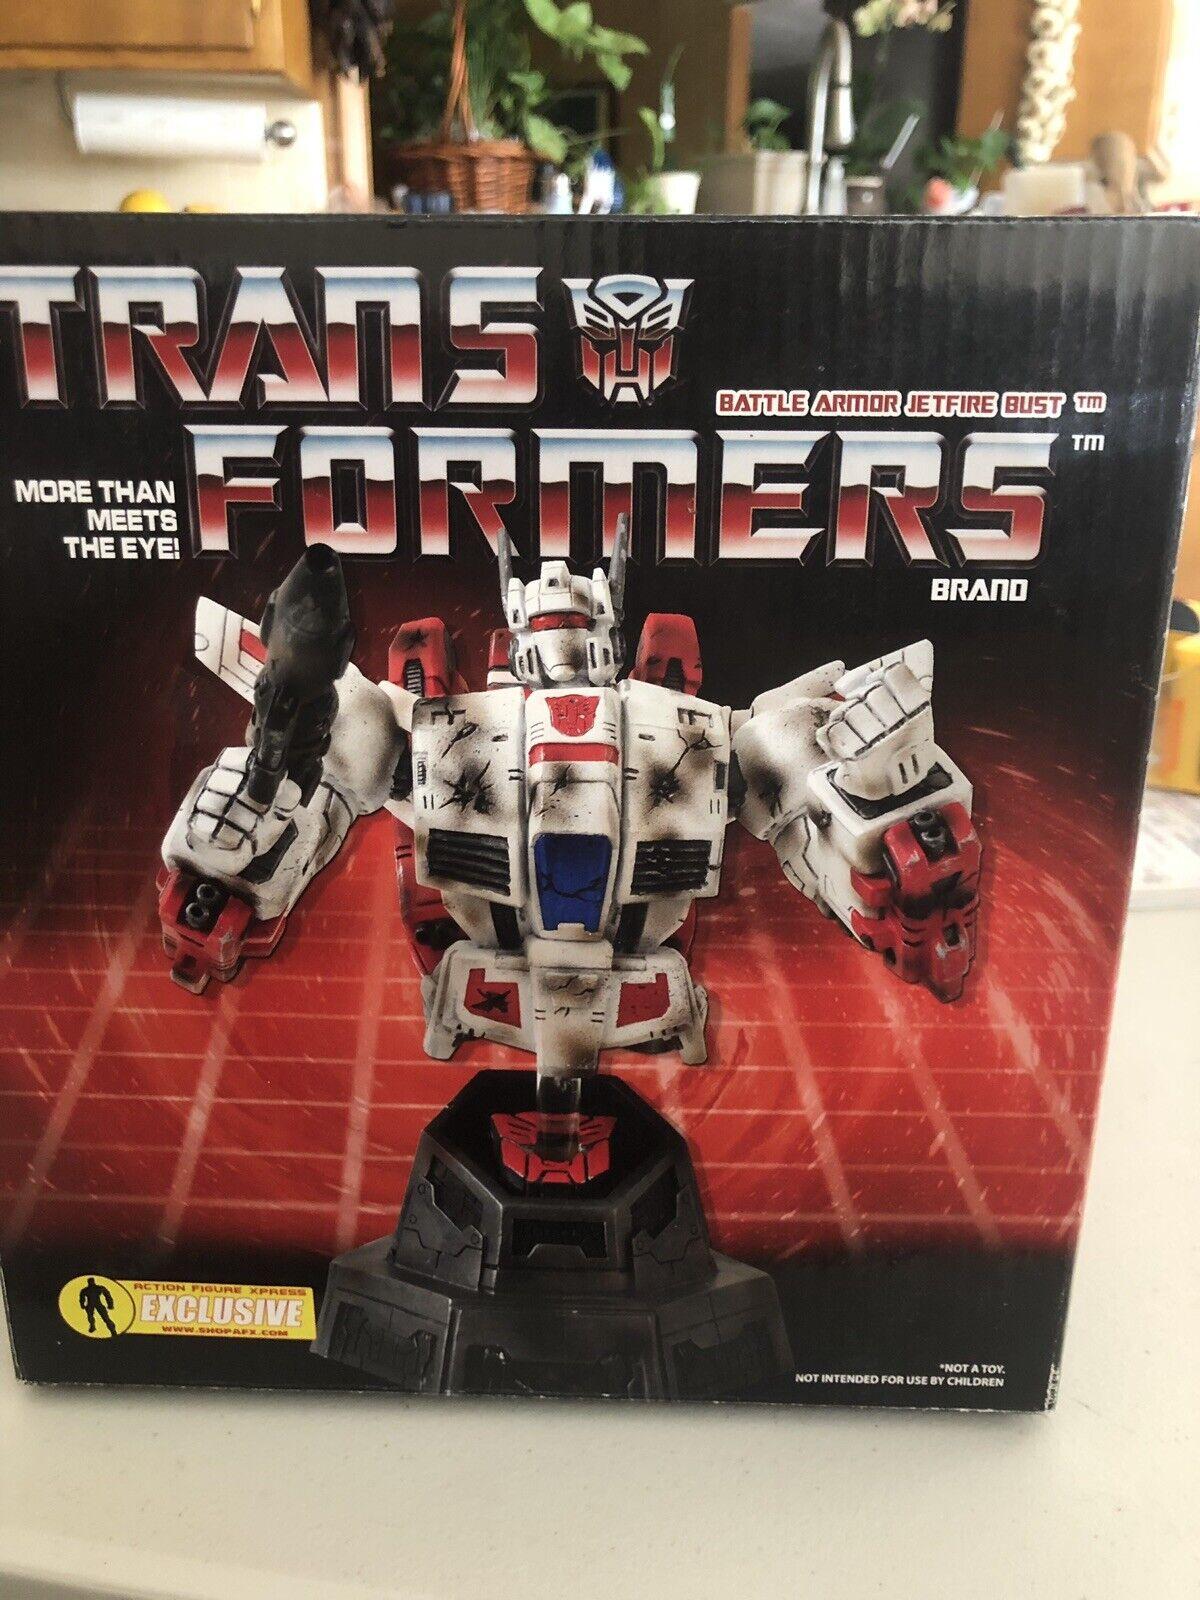 Diamond Transformers Transformers Transformers G1 Jetfire Battle Armor Variant Bust Statue AFX Exclusive bbeb43